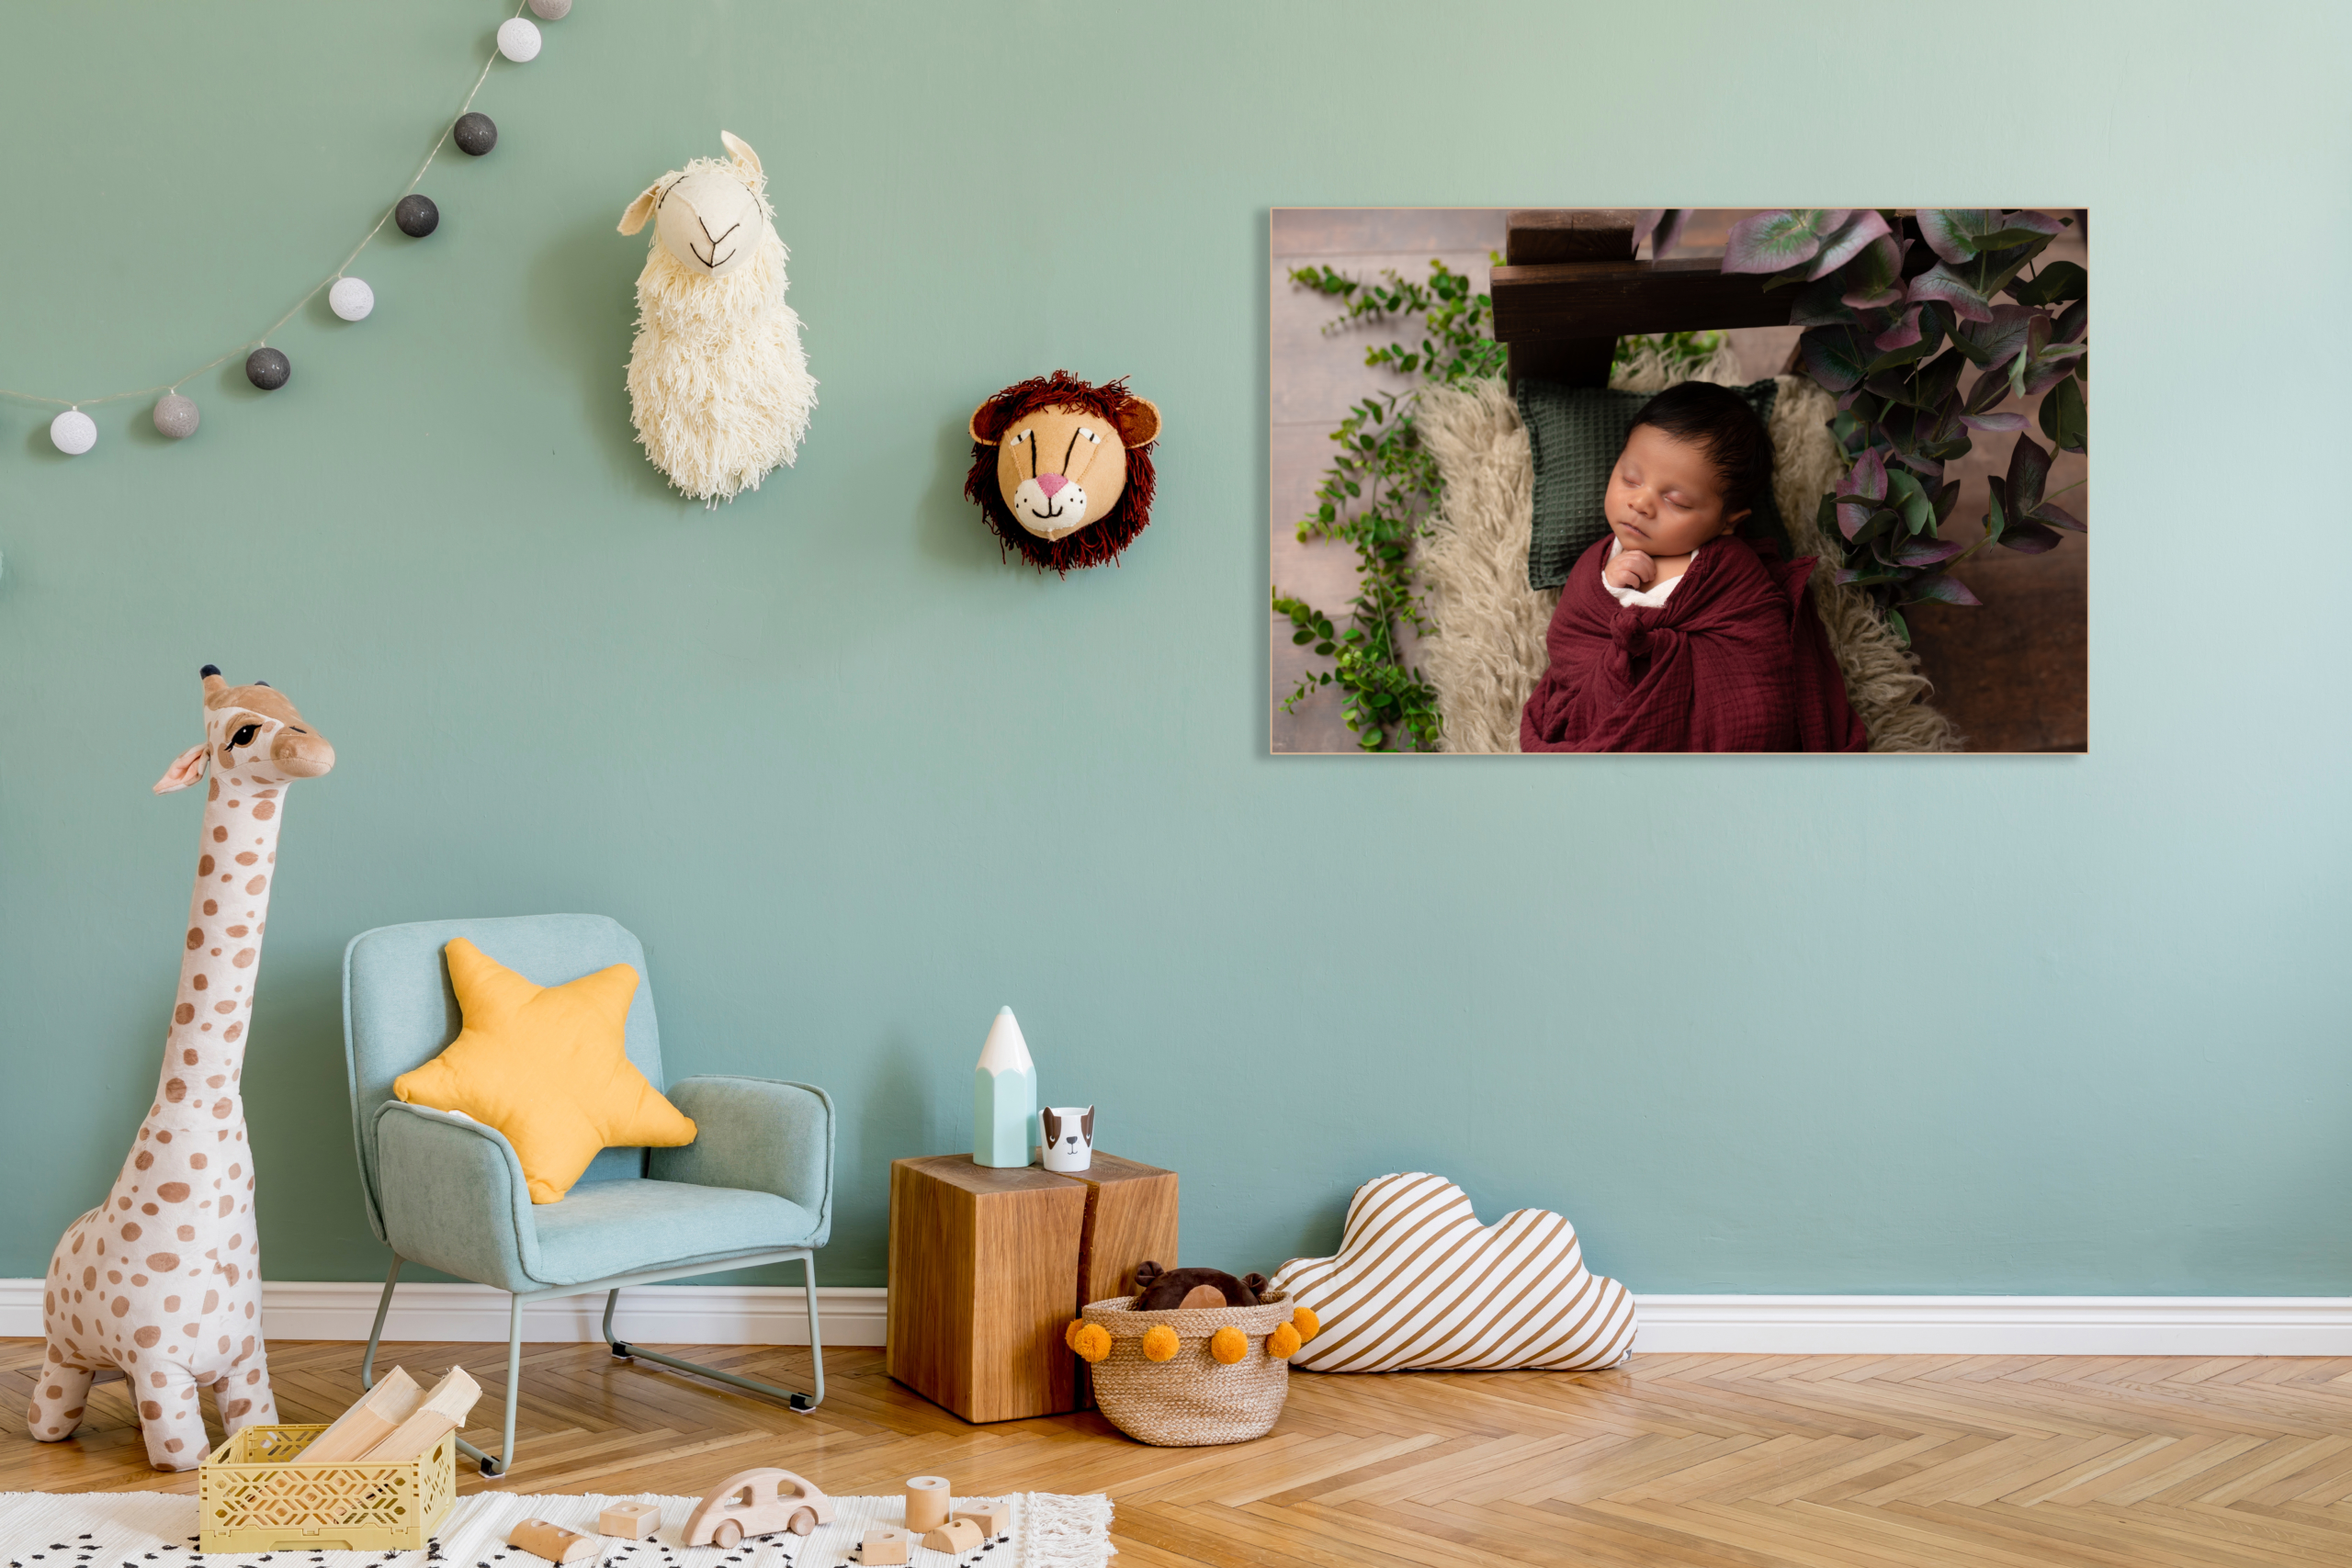 Stylish scandinavian kid room with toys, teddy bear, plush anima